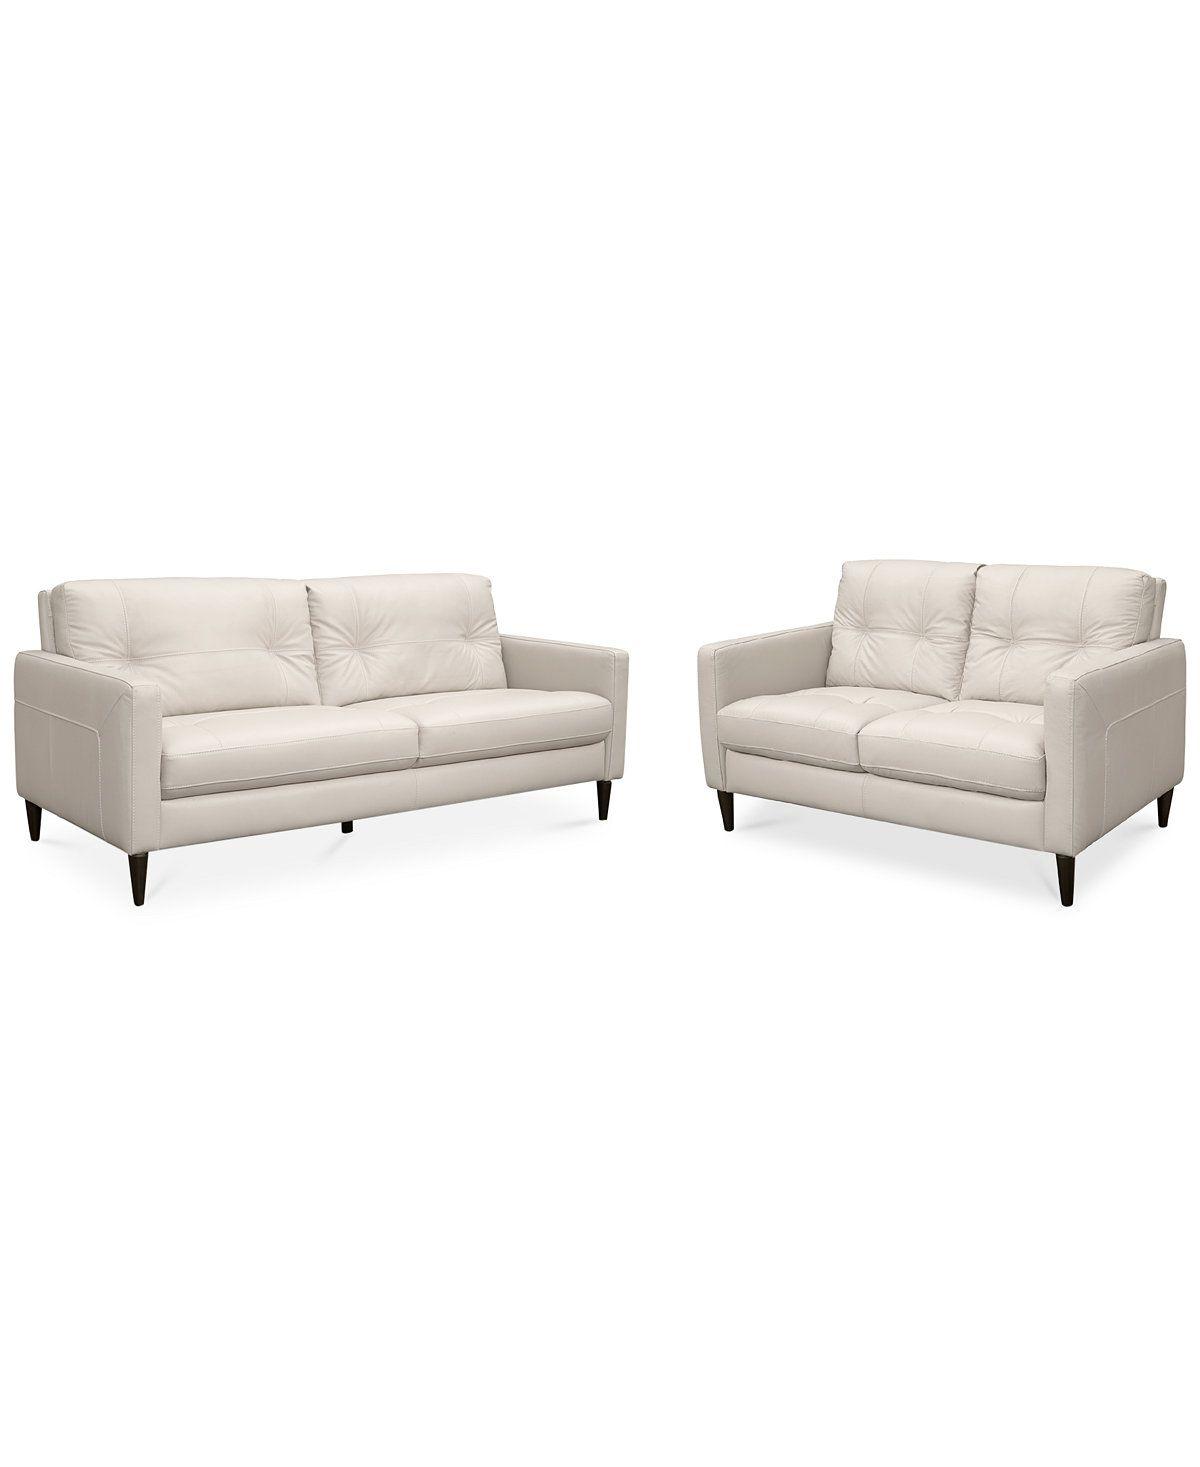 Keaton Leather Sofa Loveseat Set Couches Sofas Furniture Macy S